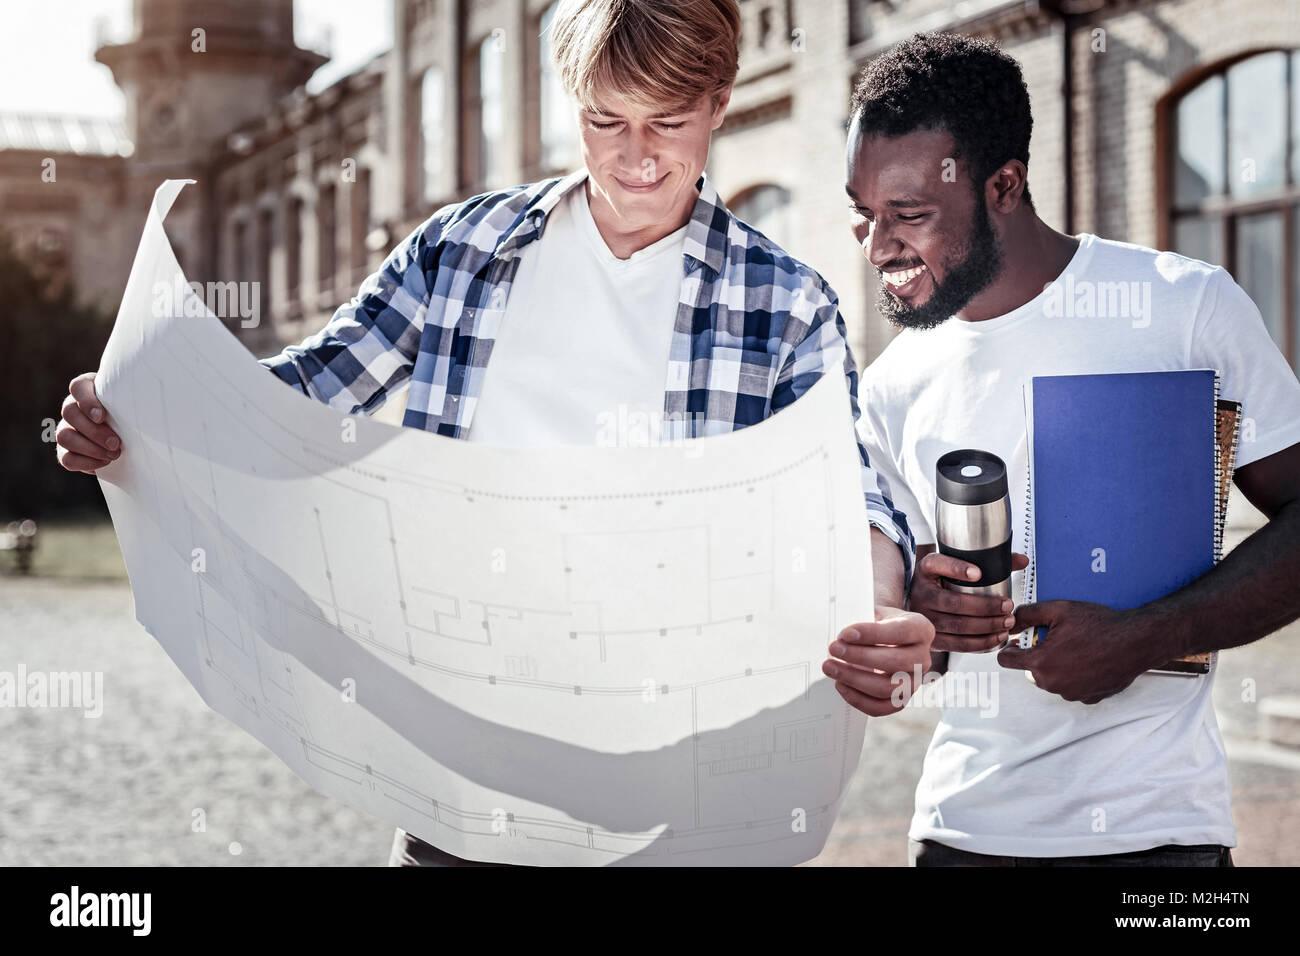 Nice smart students studying the blueprint - Stock Image